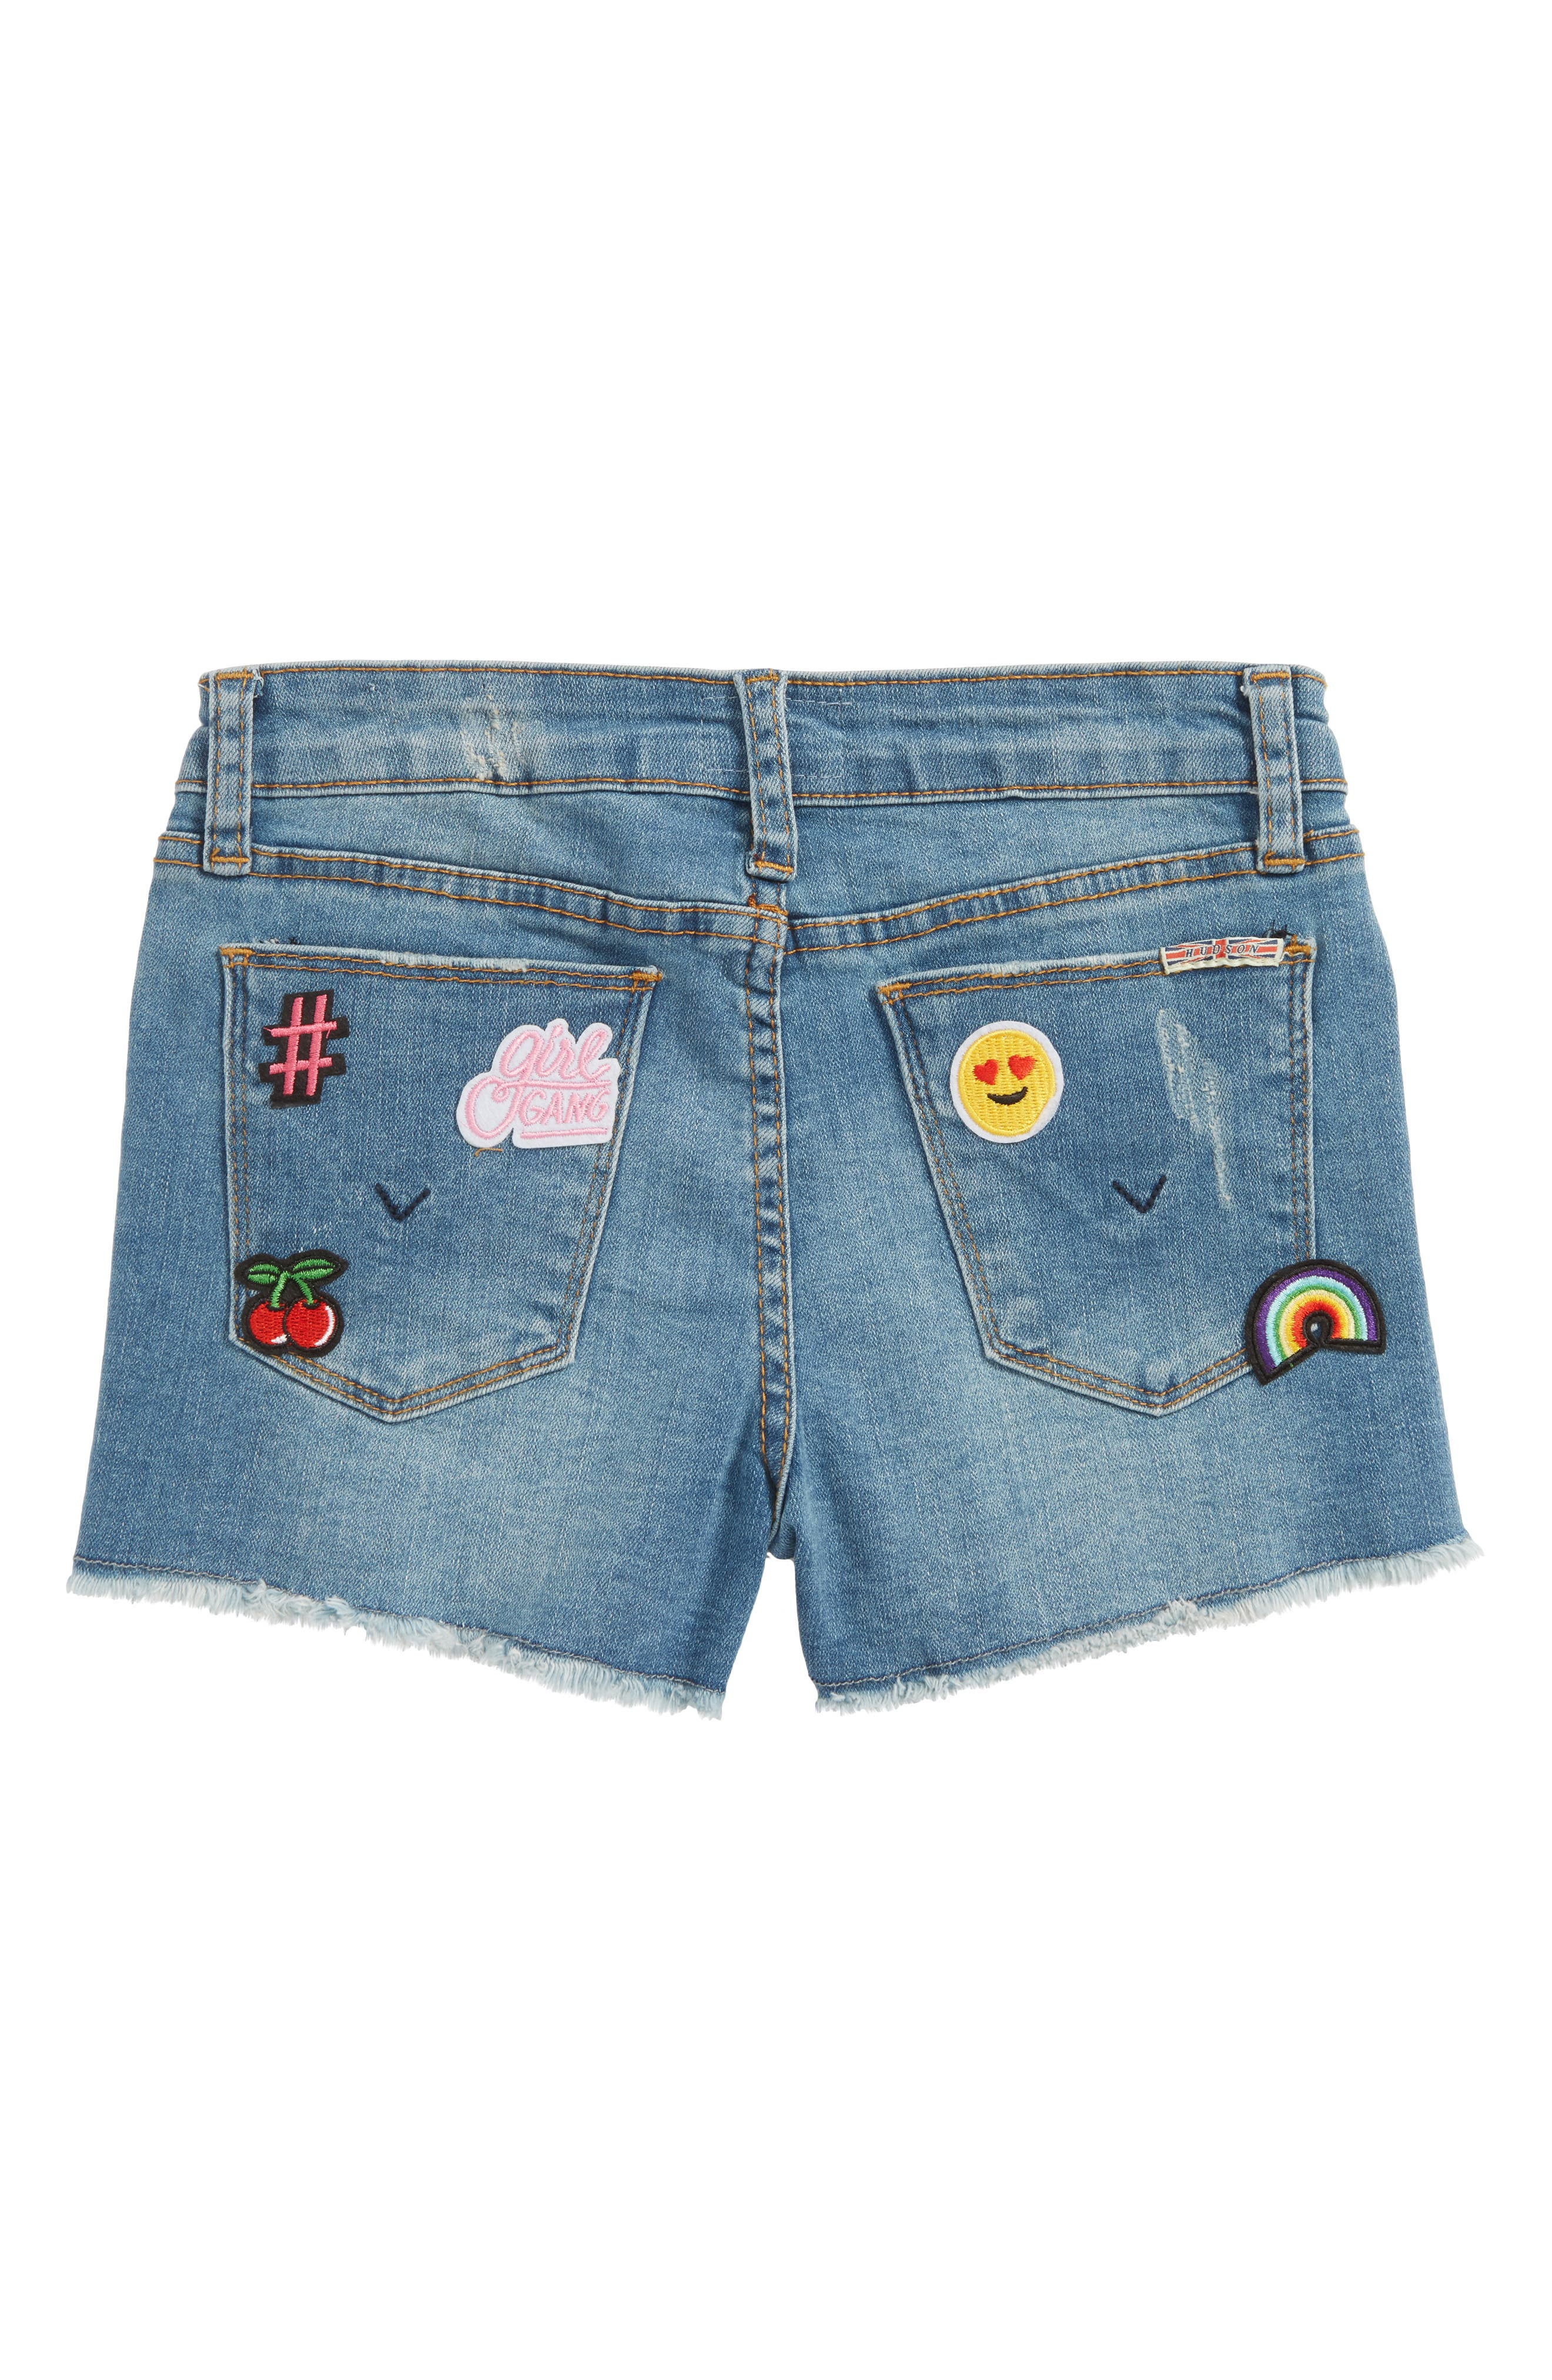 Patchy Cutoff Denim Shorts,                             Alternate thumbnail 2, color,                             400